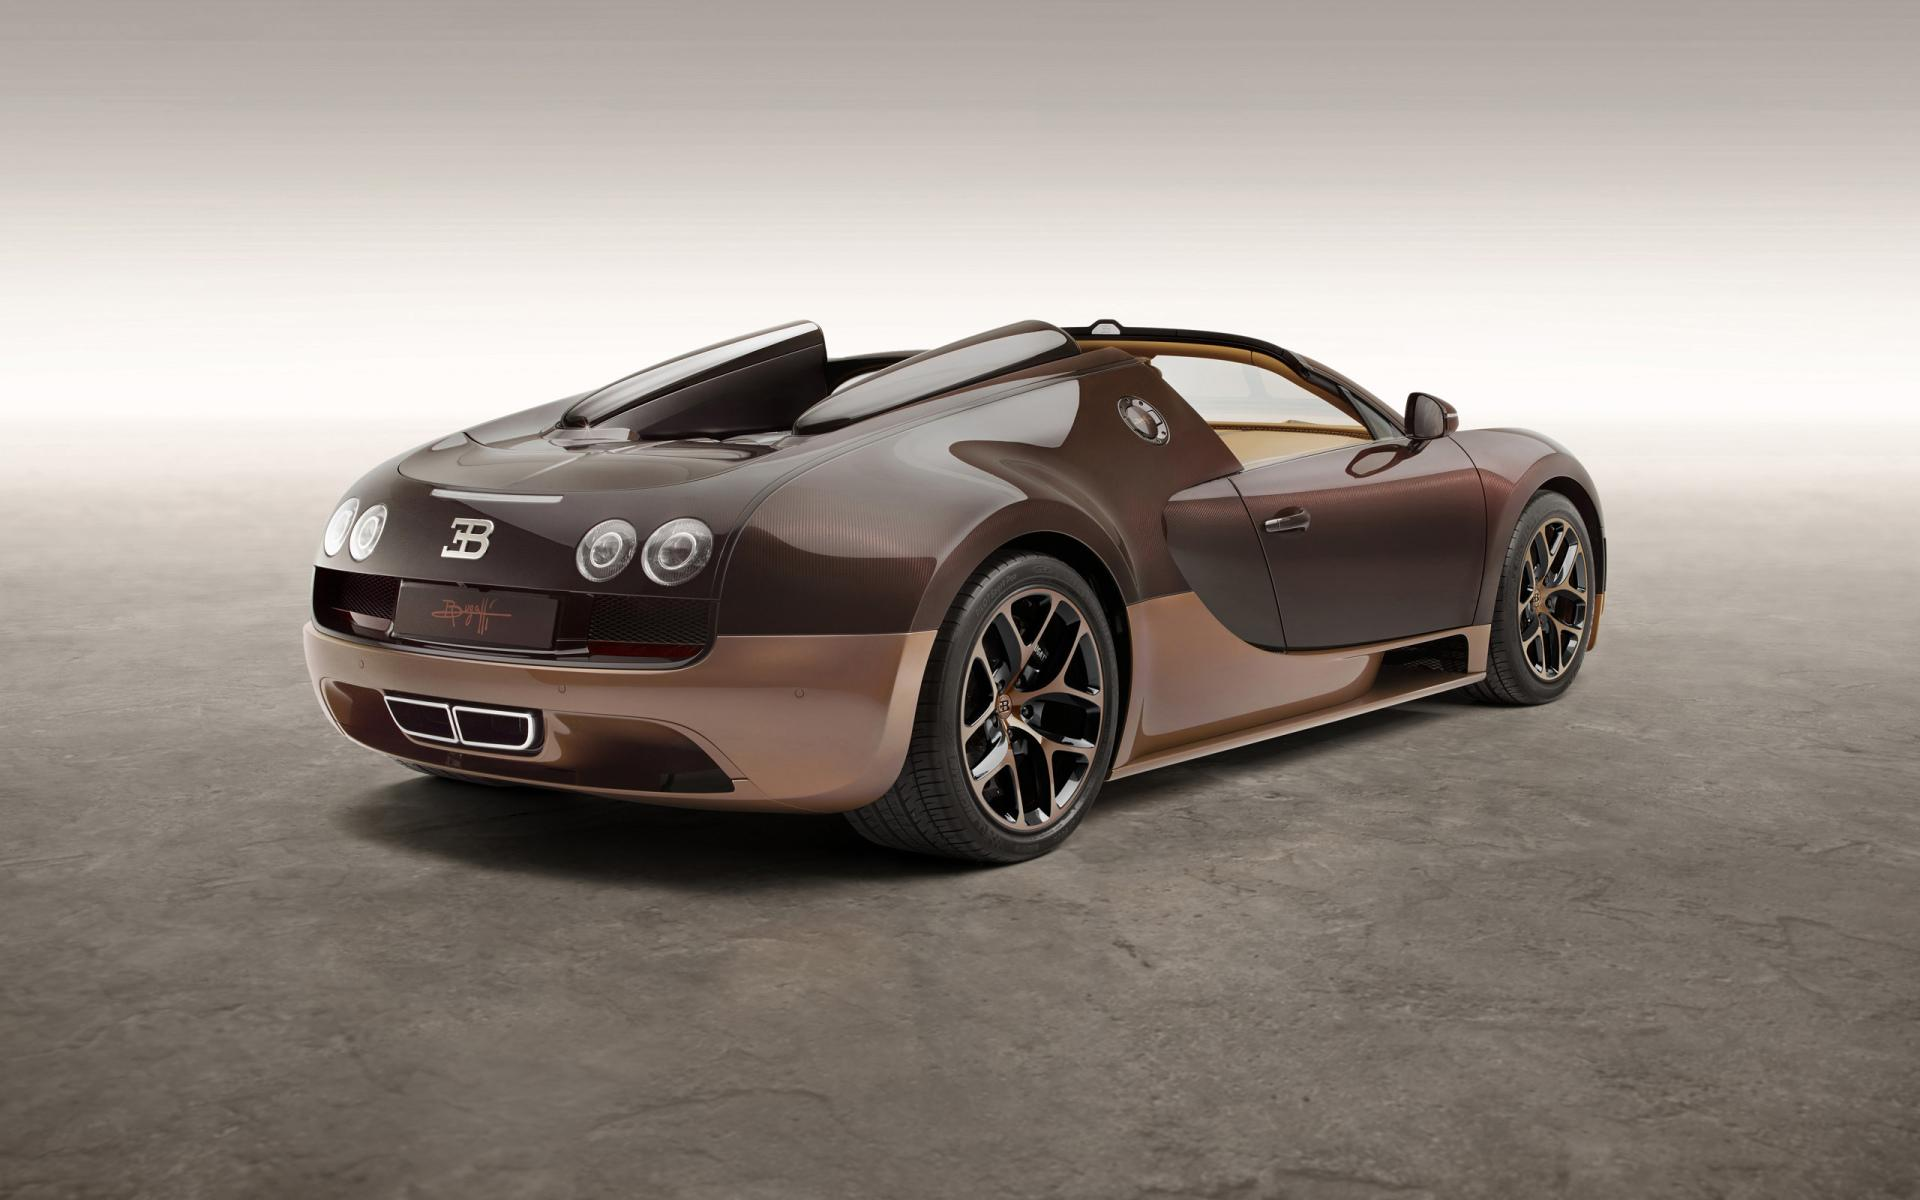 bugatti veyron grand sport vitesse wallpaper hd download. Black Bedroom Furniture Sets. Home Design Ideas